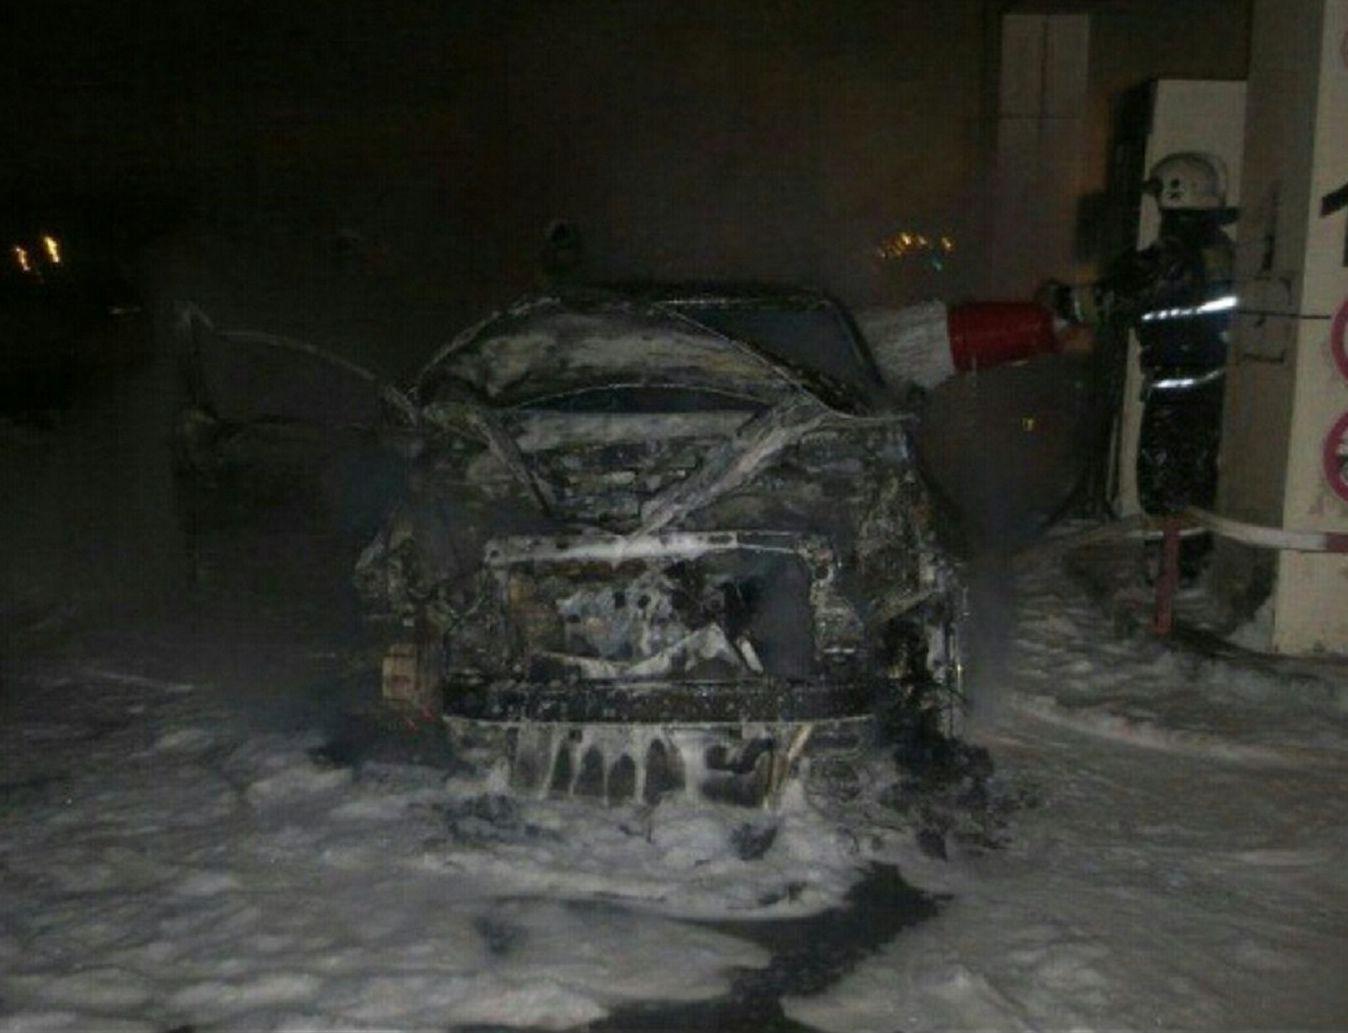 Автомобиль сгорел дотла на АЗС